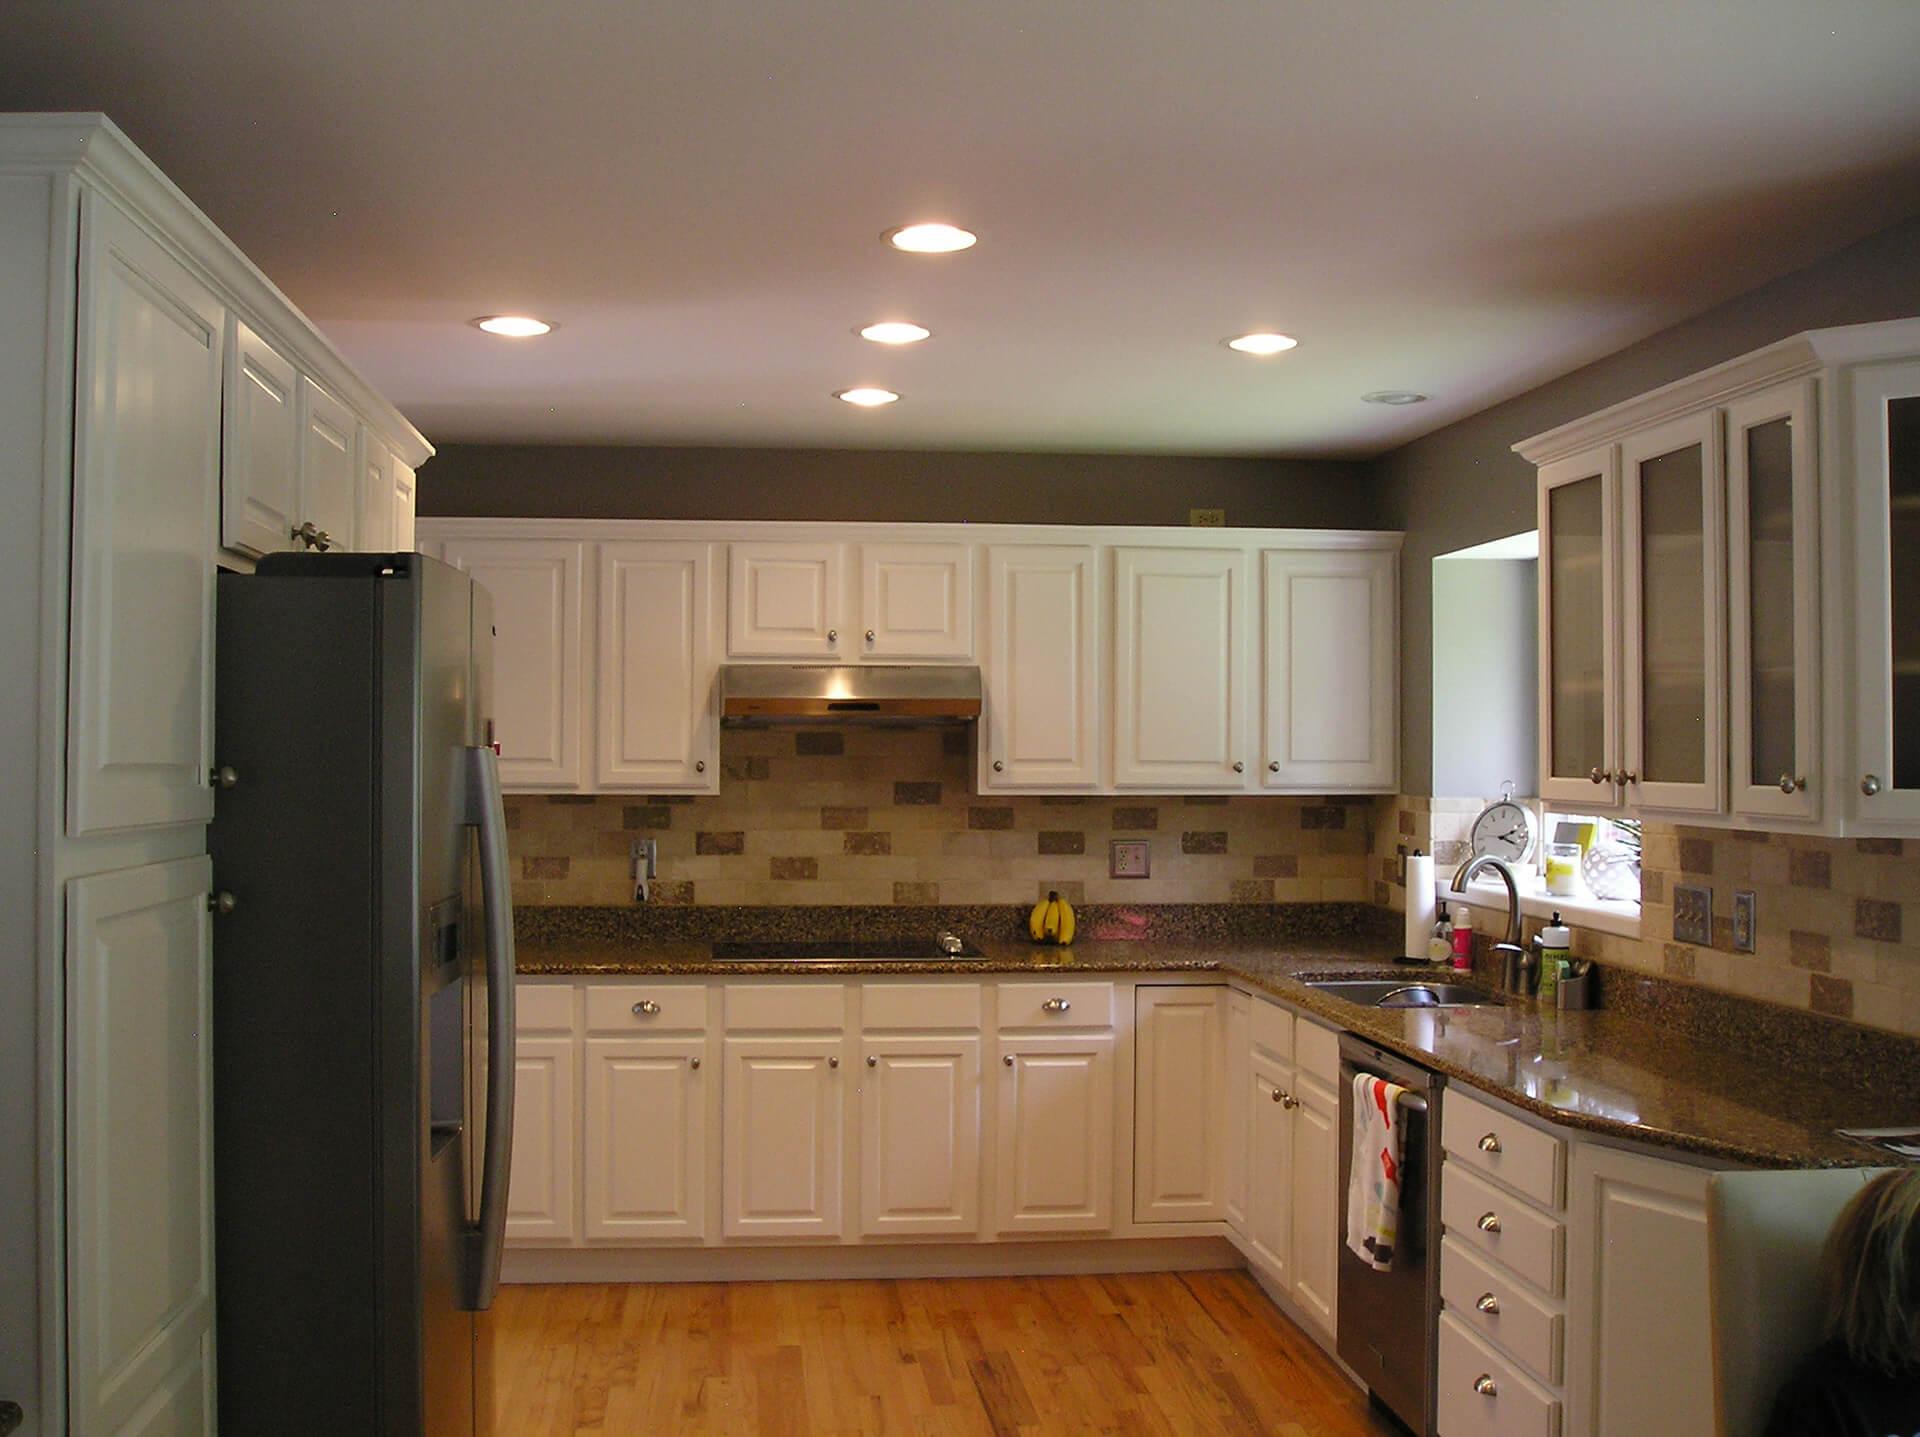 Kitchen Cabinet Photo Gallery 171 Crowder Painting